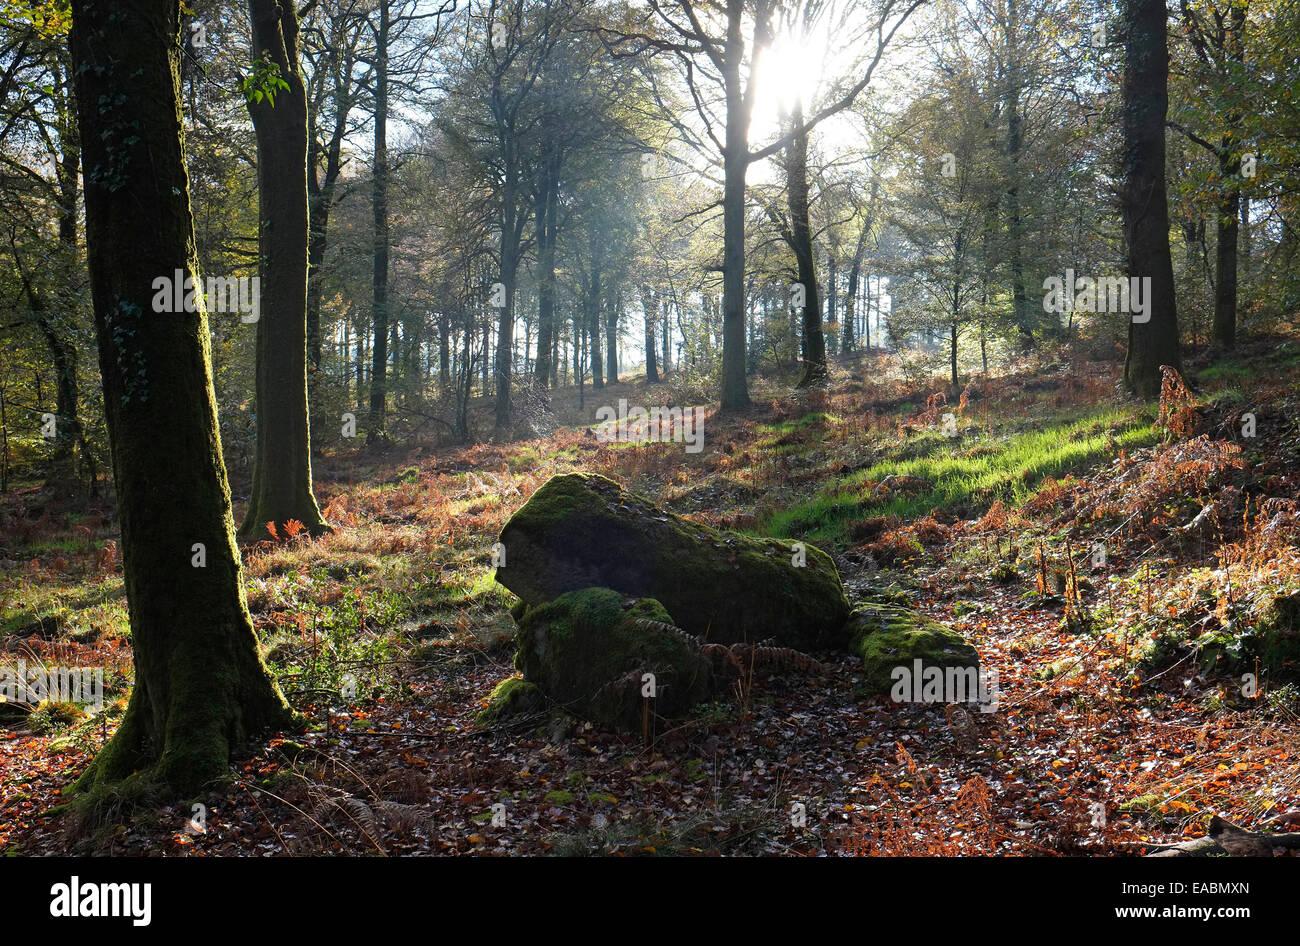 st sever forest, calvados region, normandy, france - Stock Image